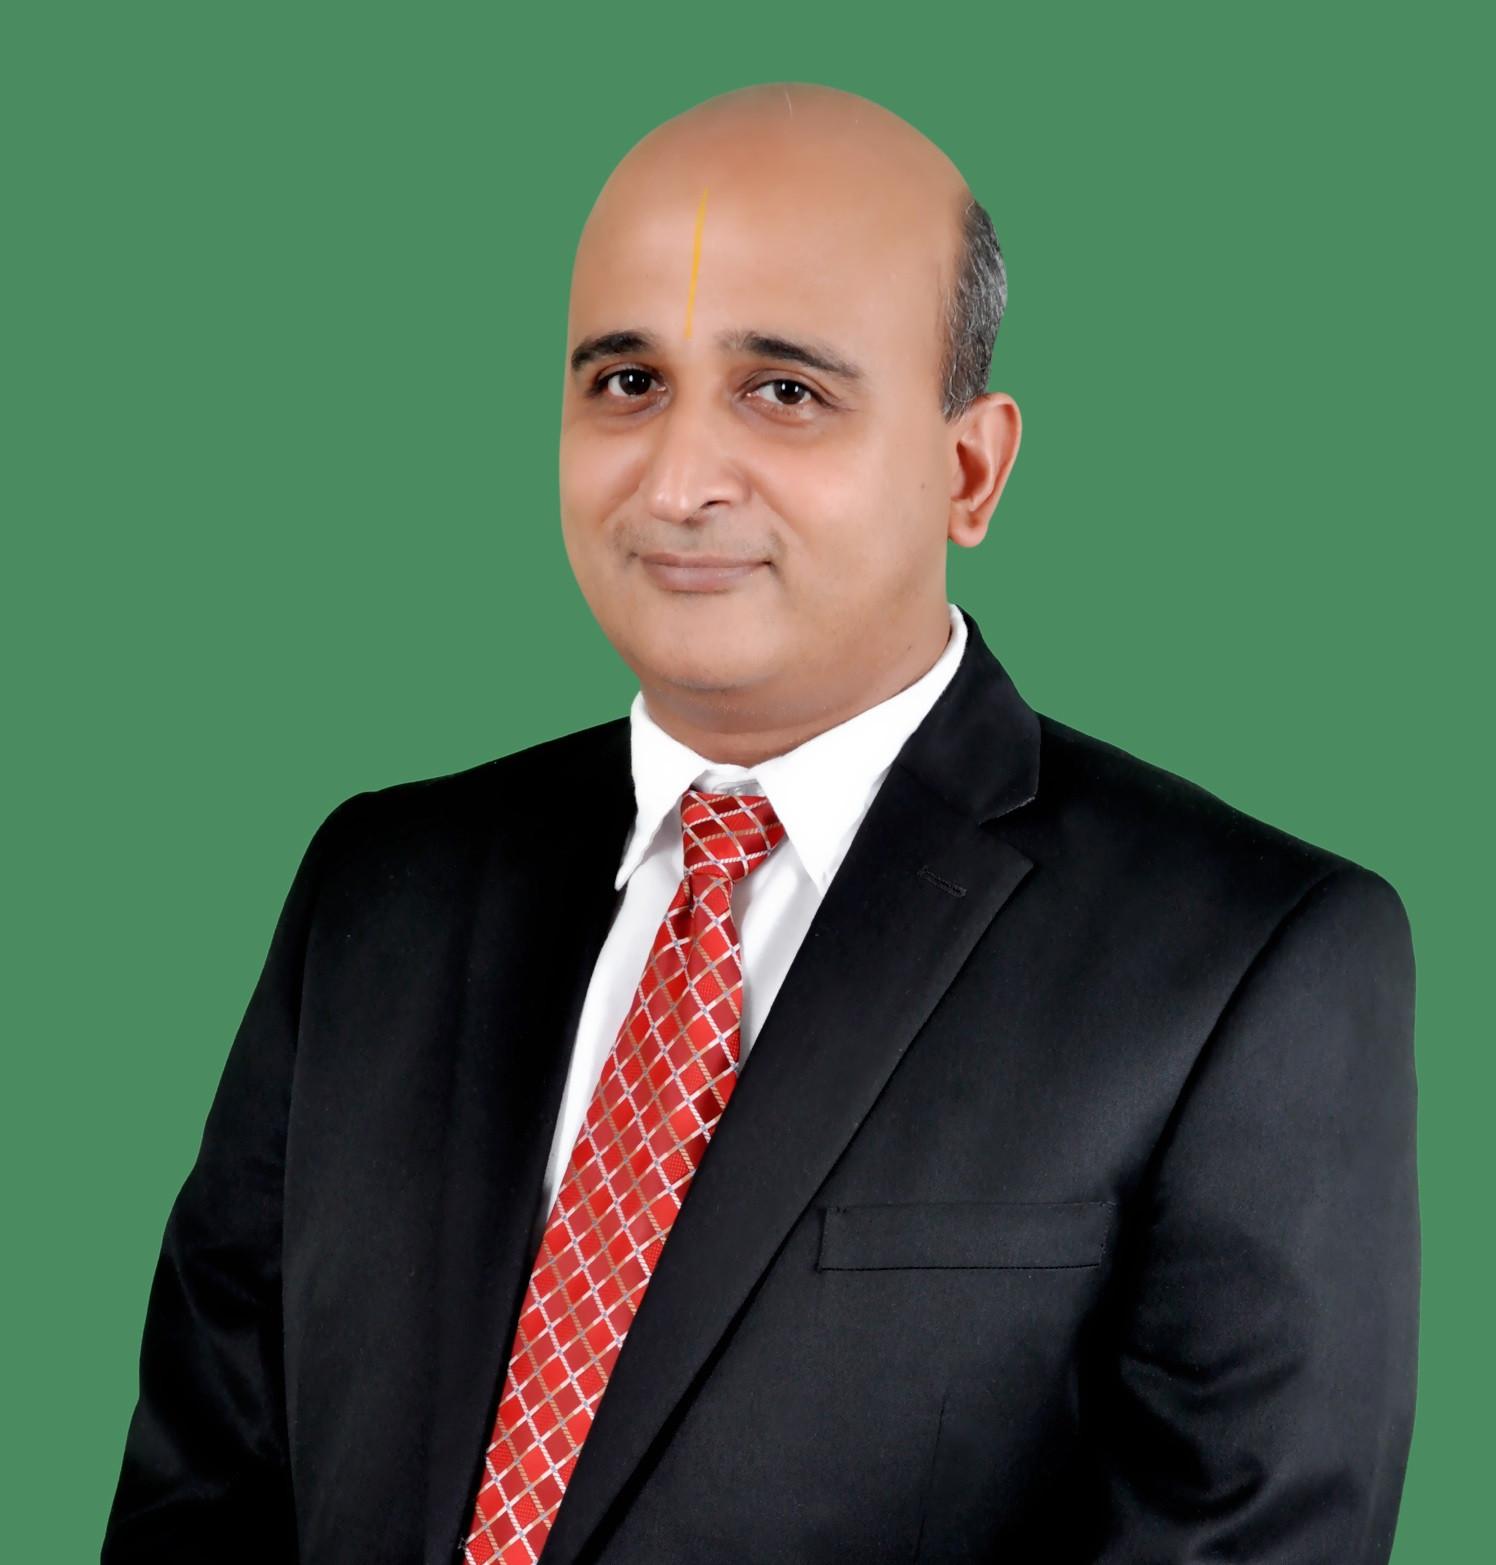 专访印度聚氨酯协会副会长 Dr. Mahesh